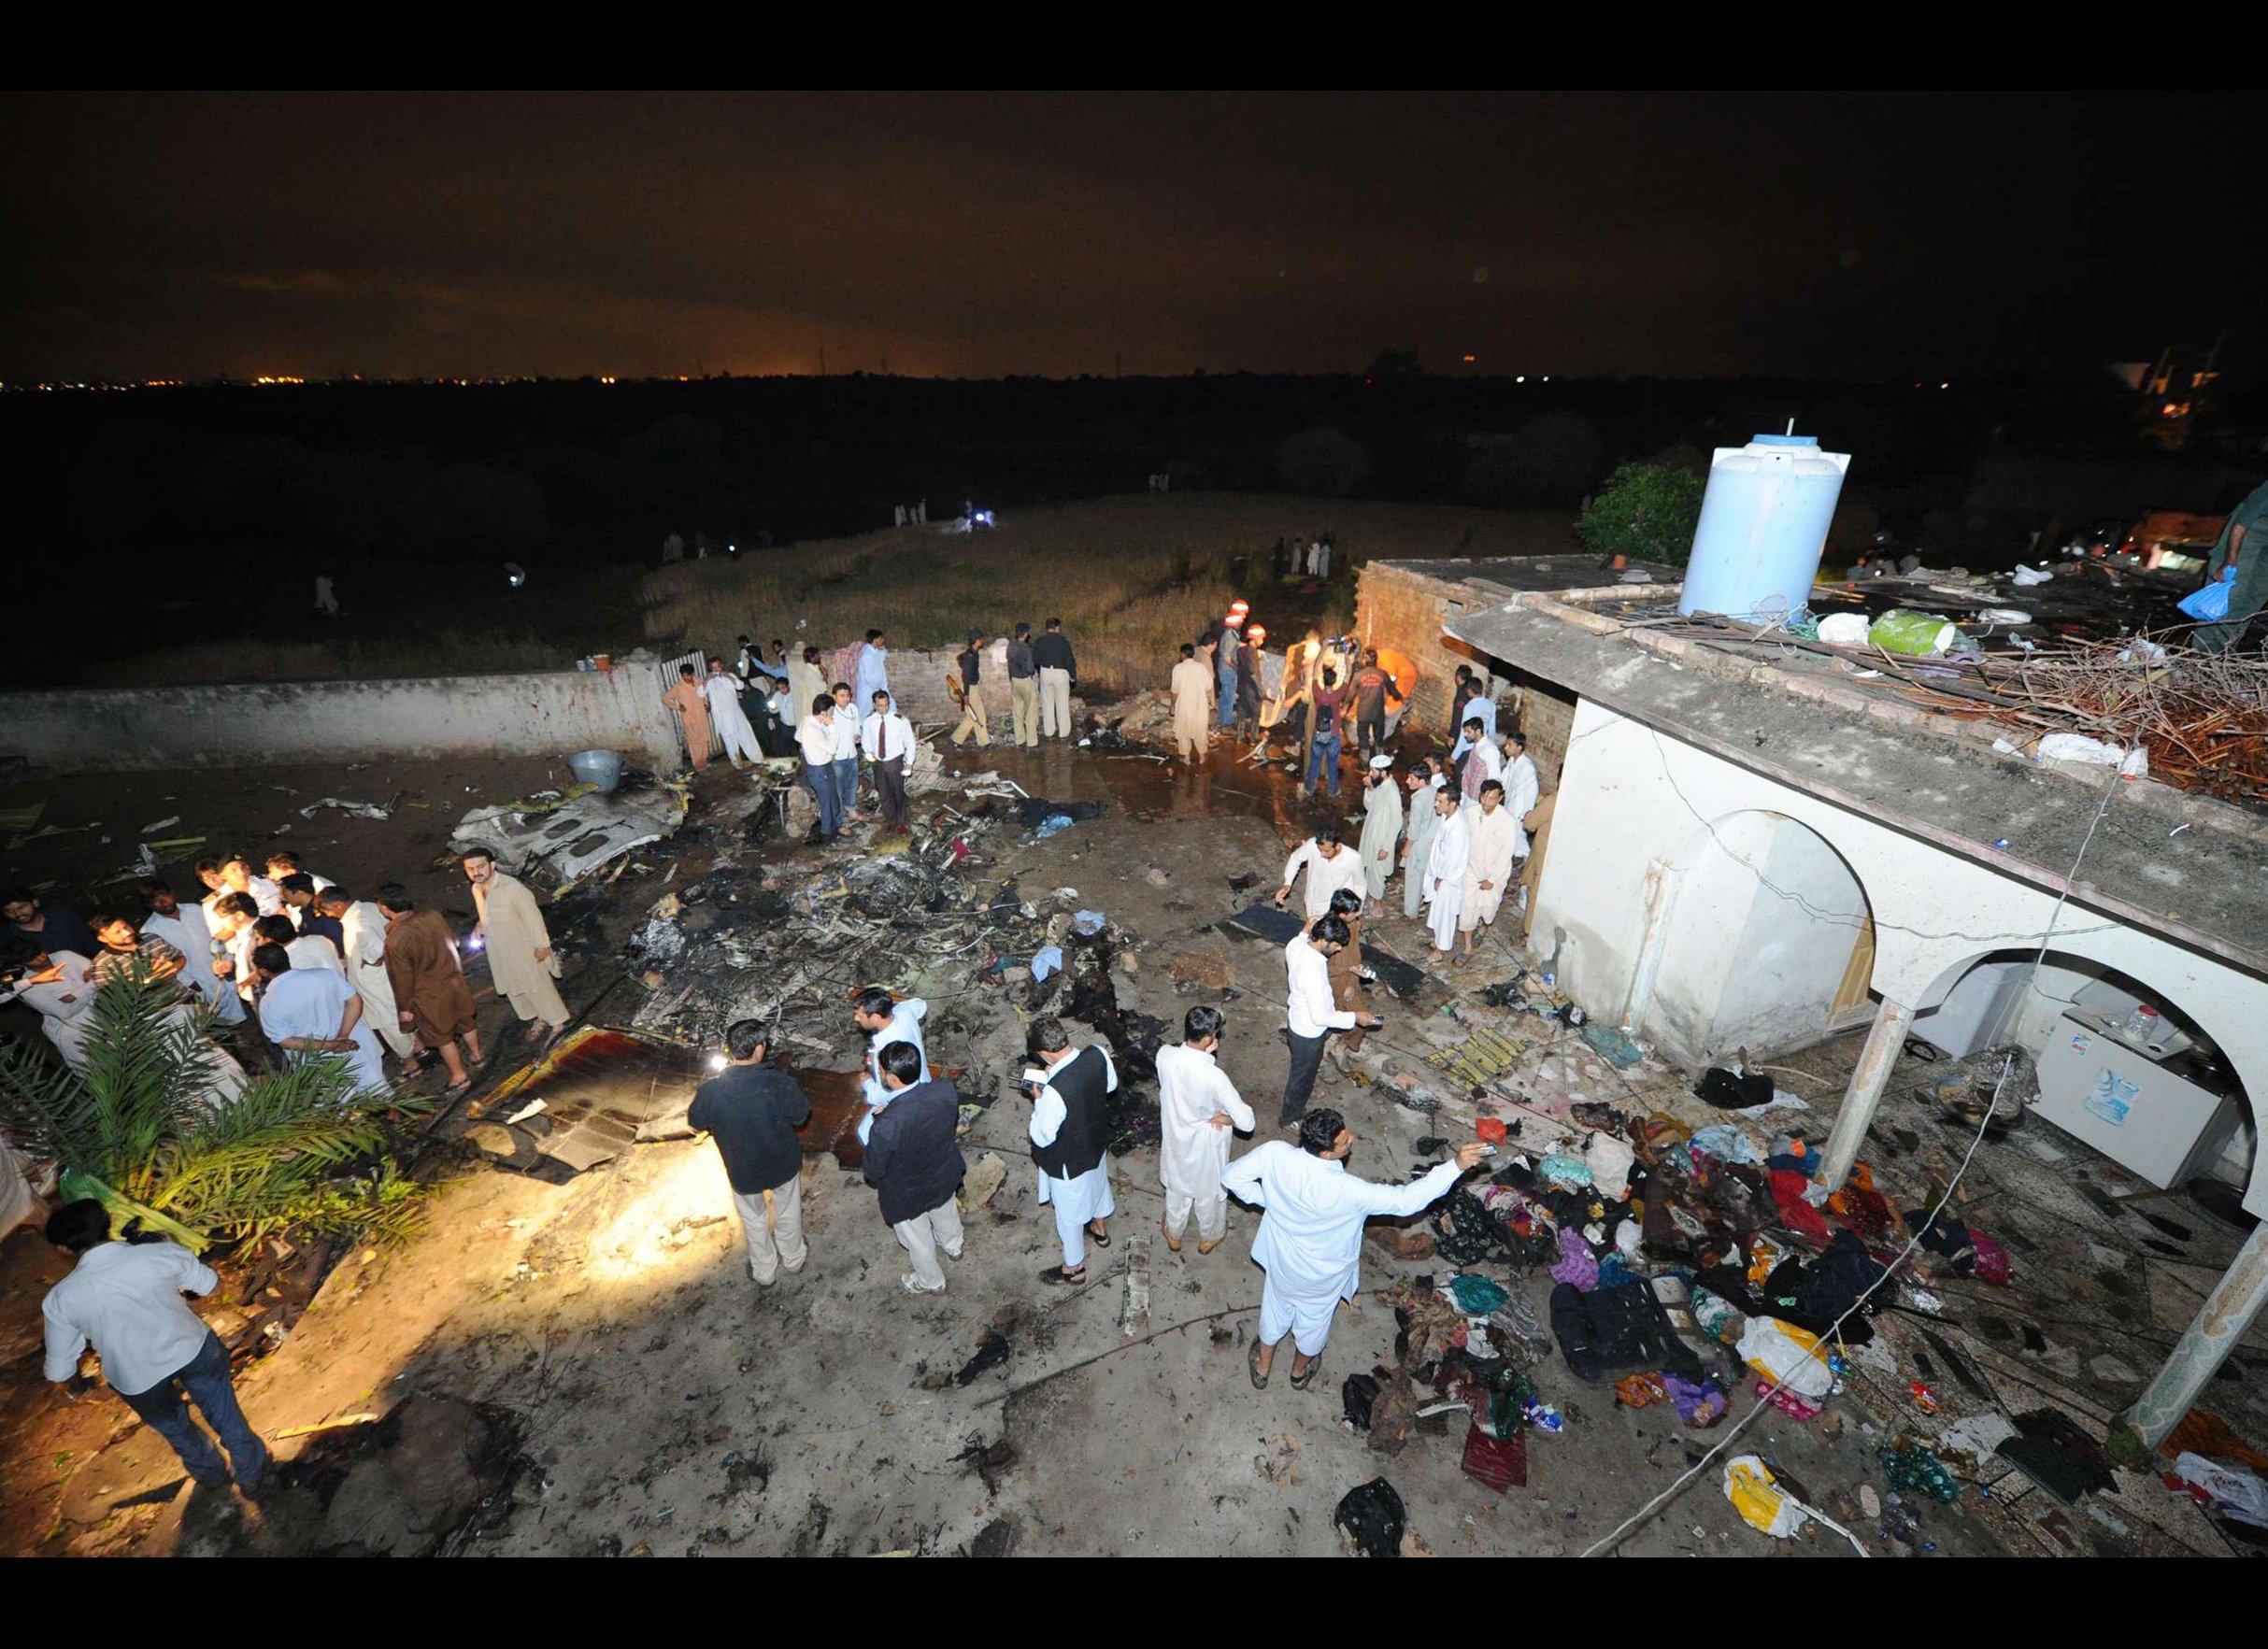 Plane Crash Bodies Photos A plane crash in islamabad